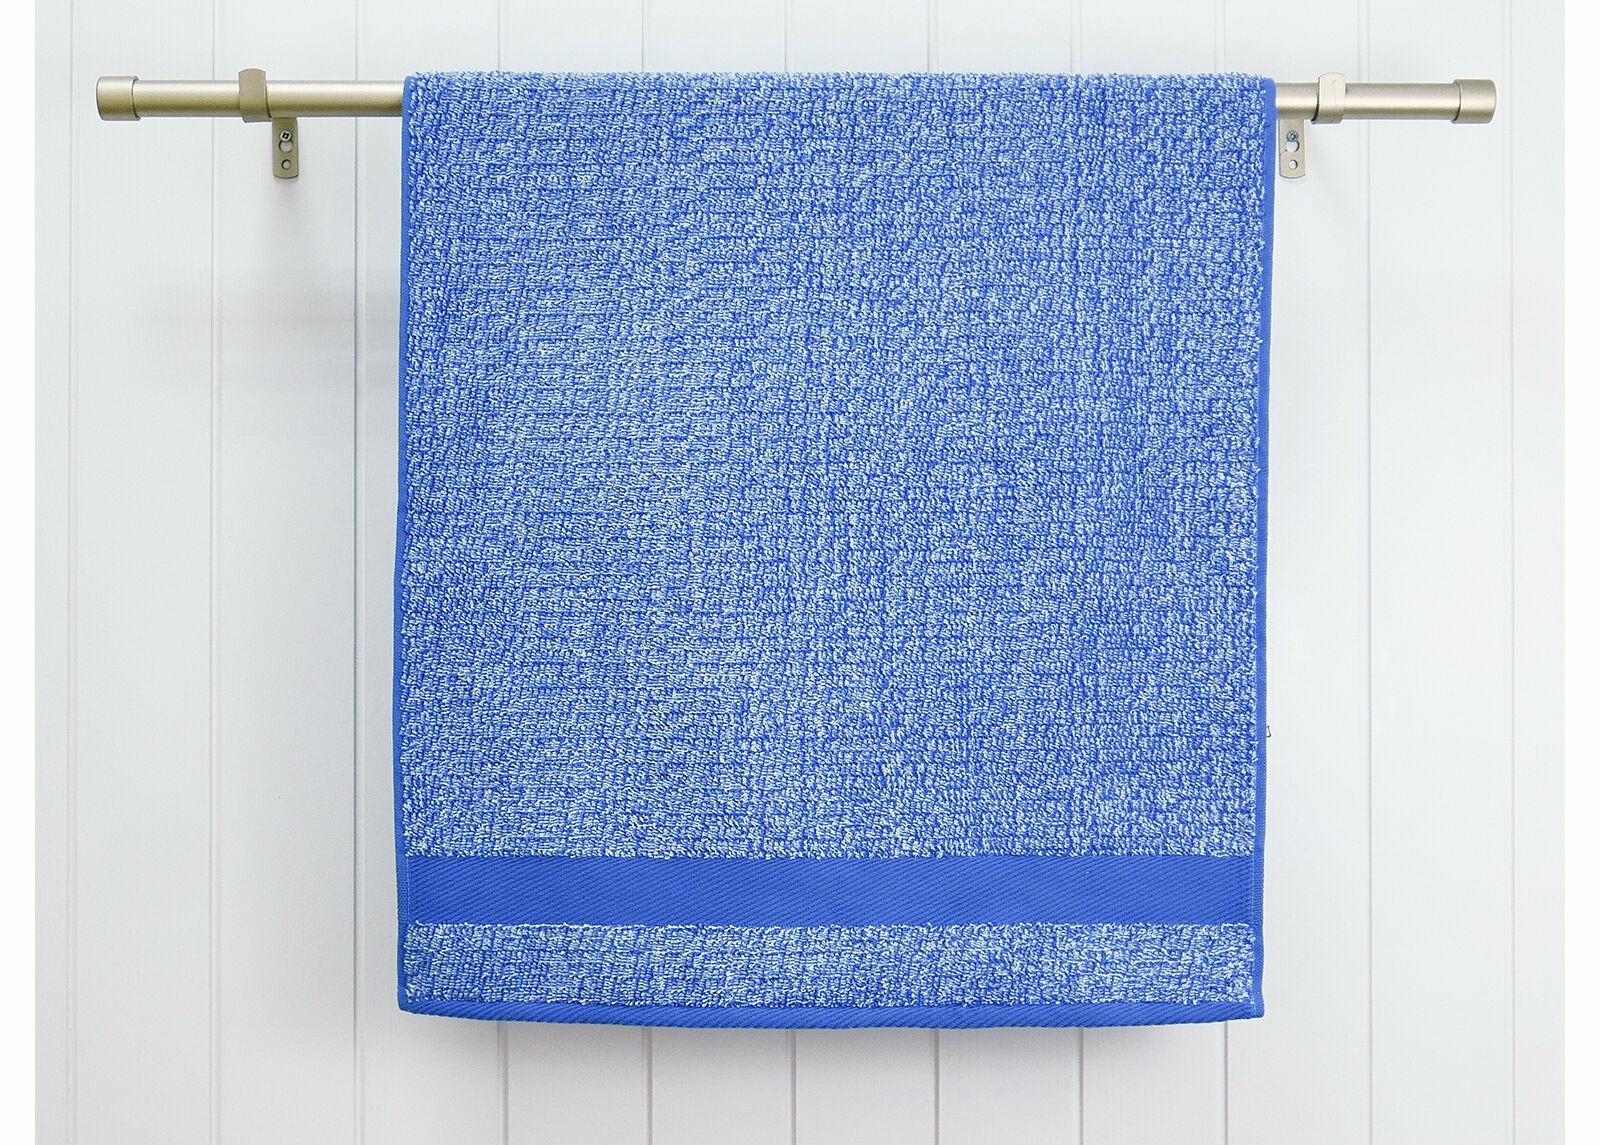 ARDENZA Froteepyyhe Melange sininen 48x90 cm, 2 kpl